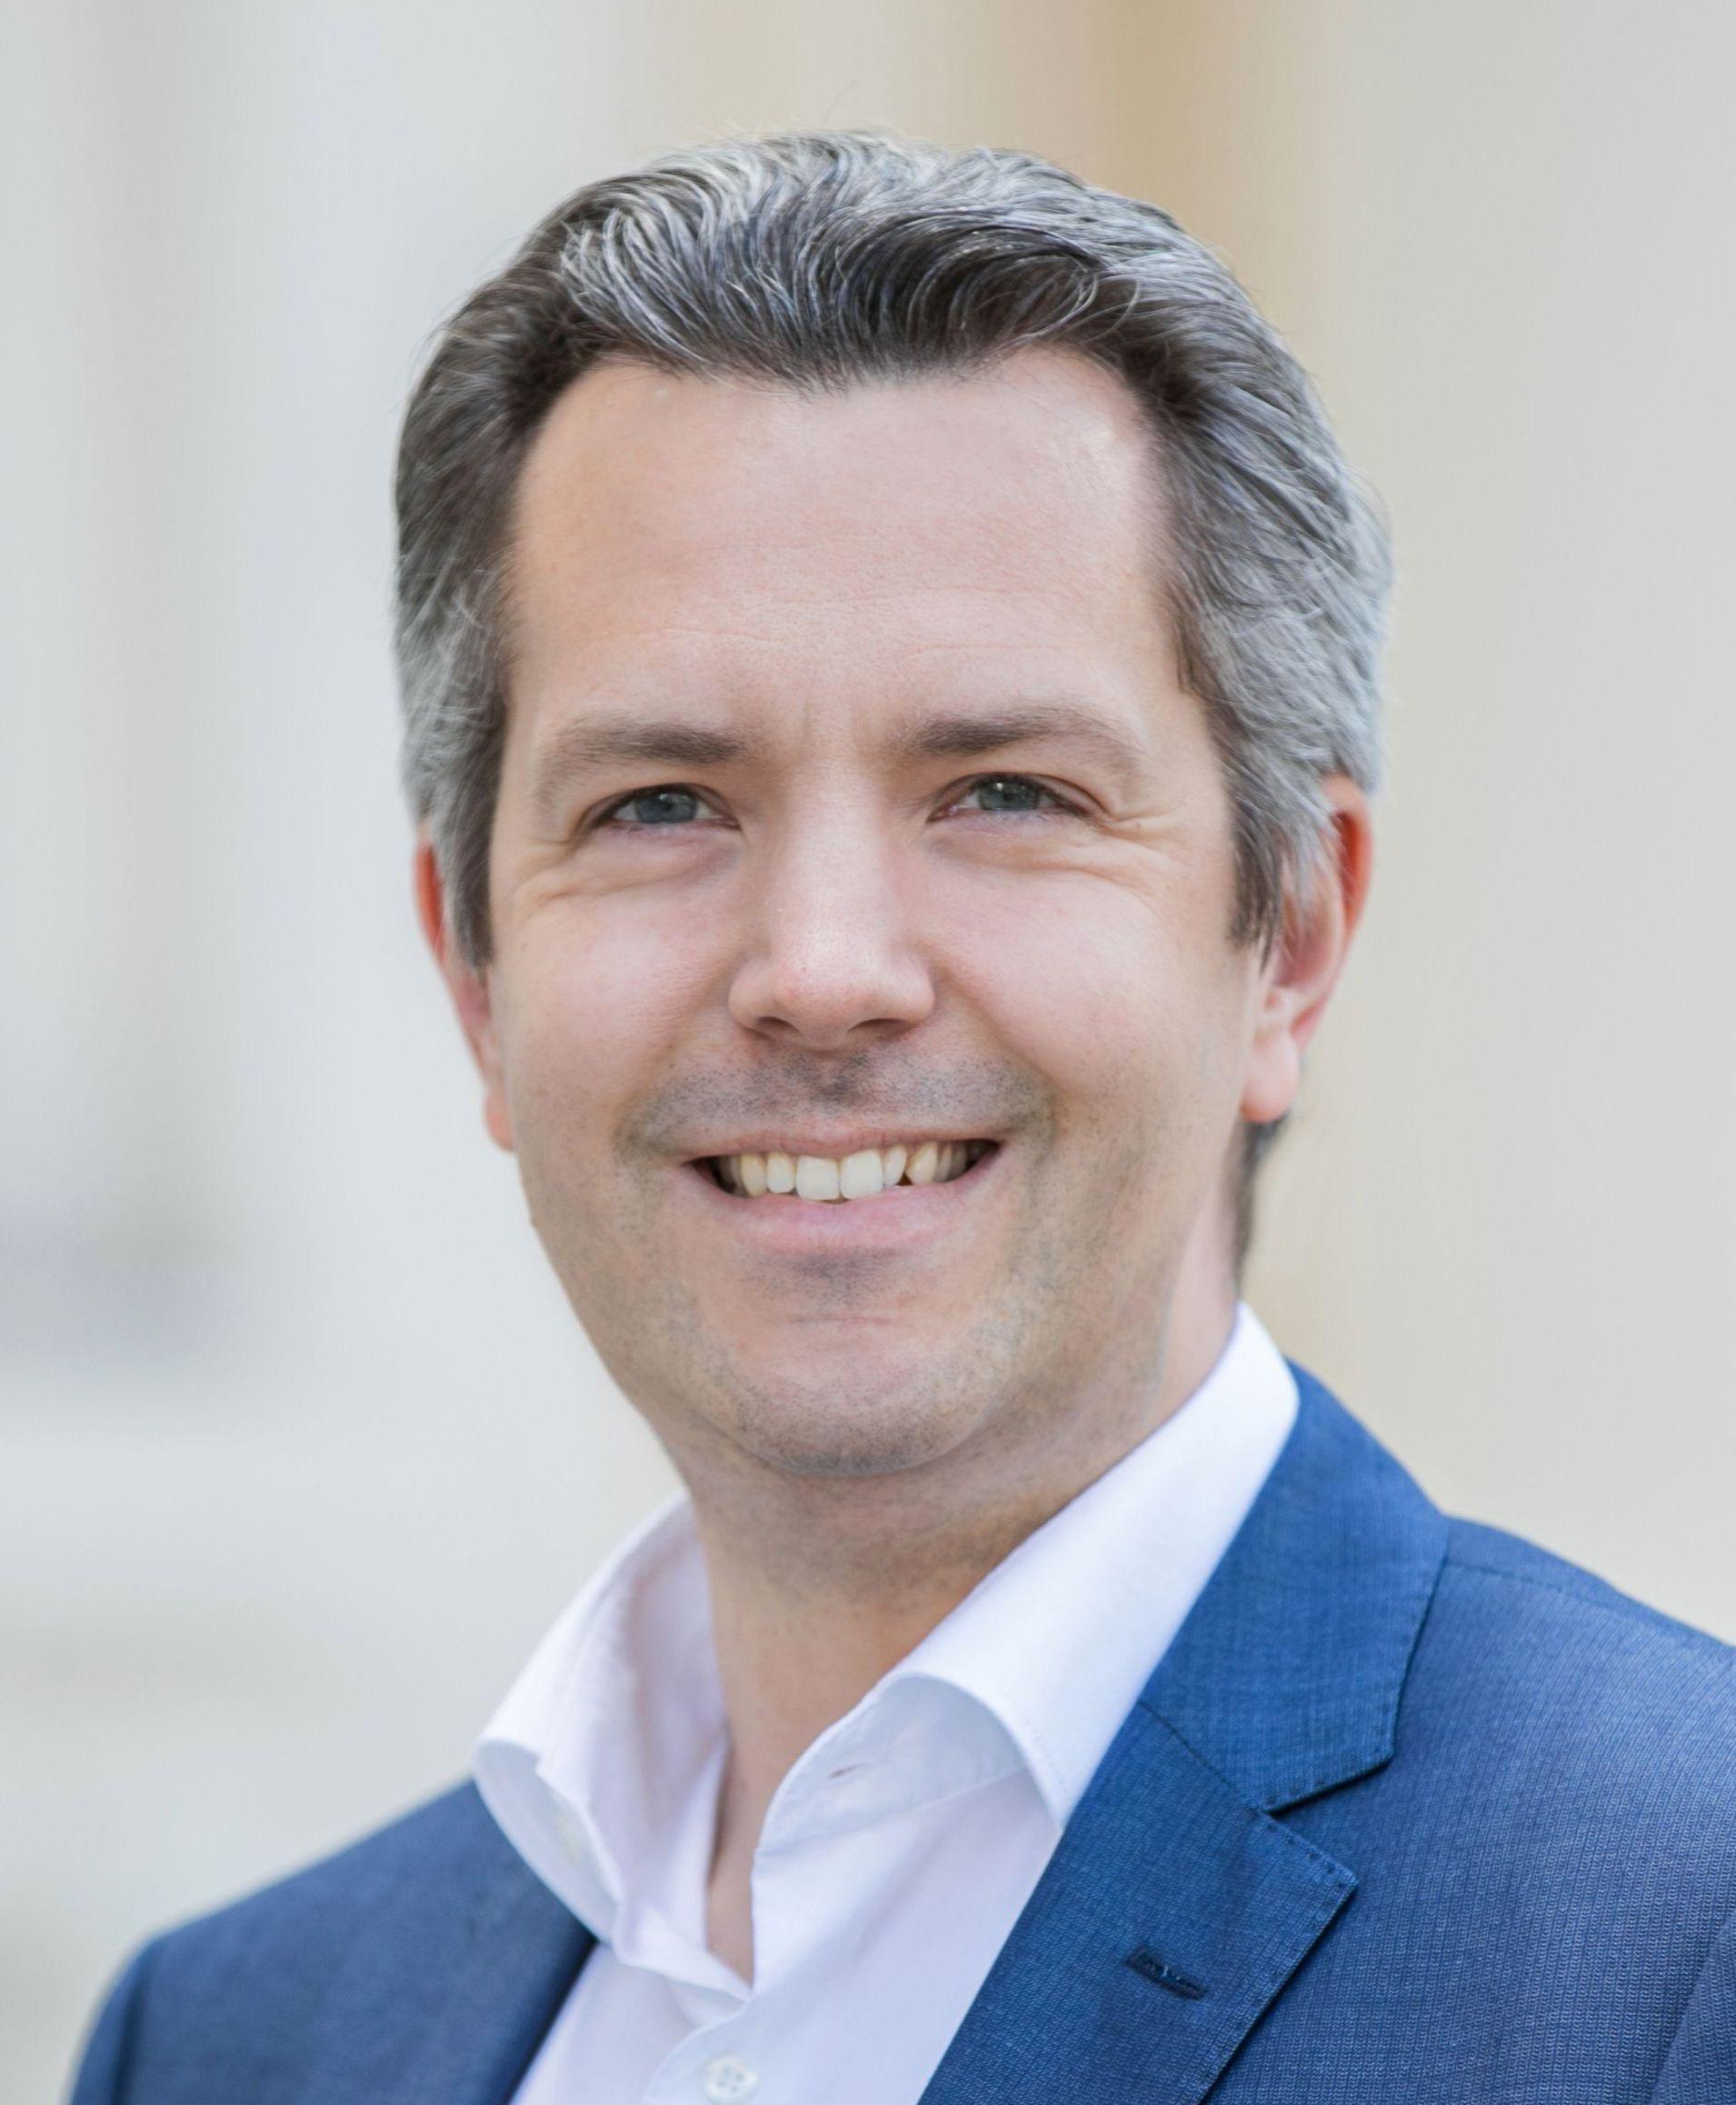 André Reininger